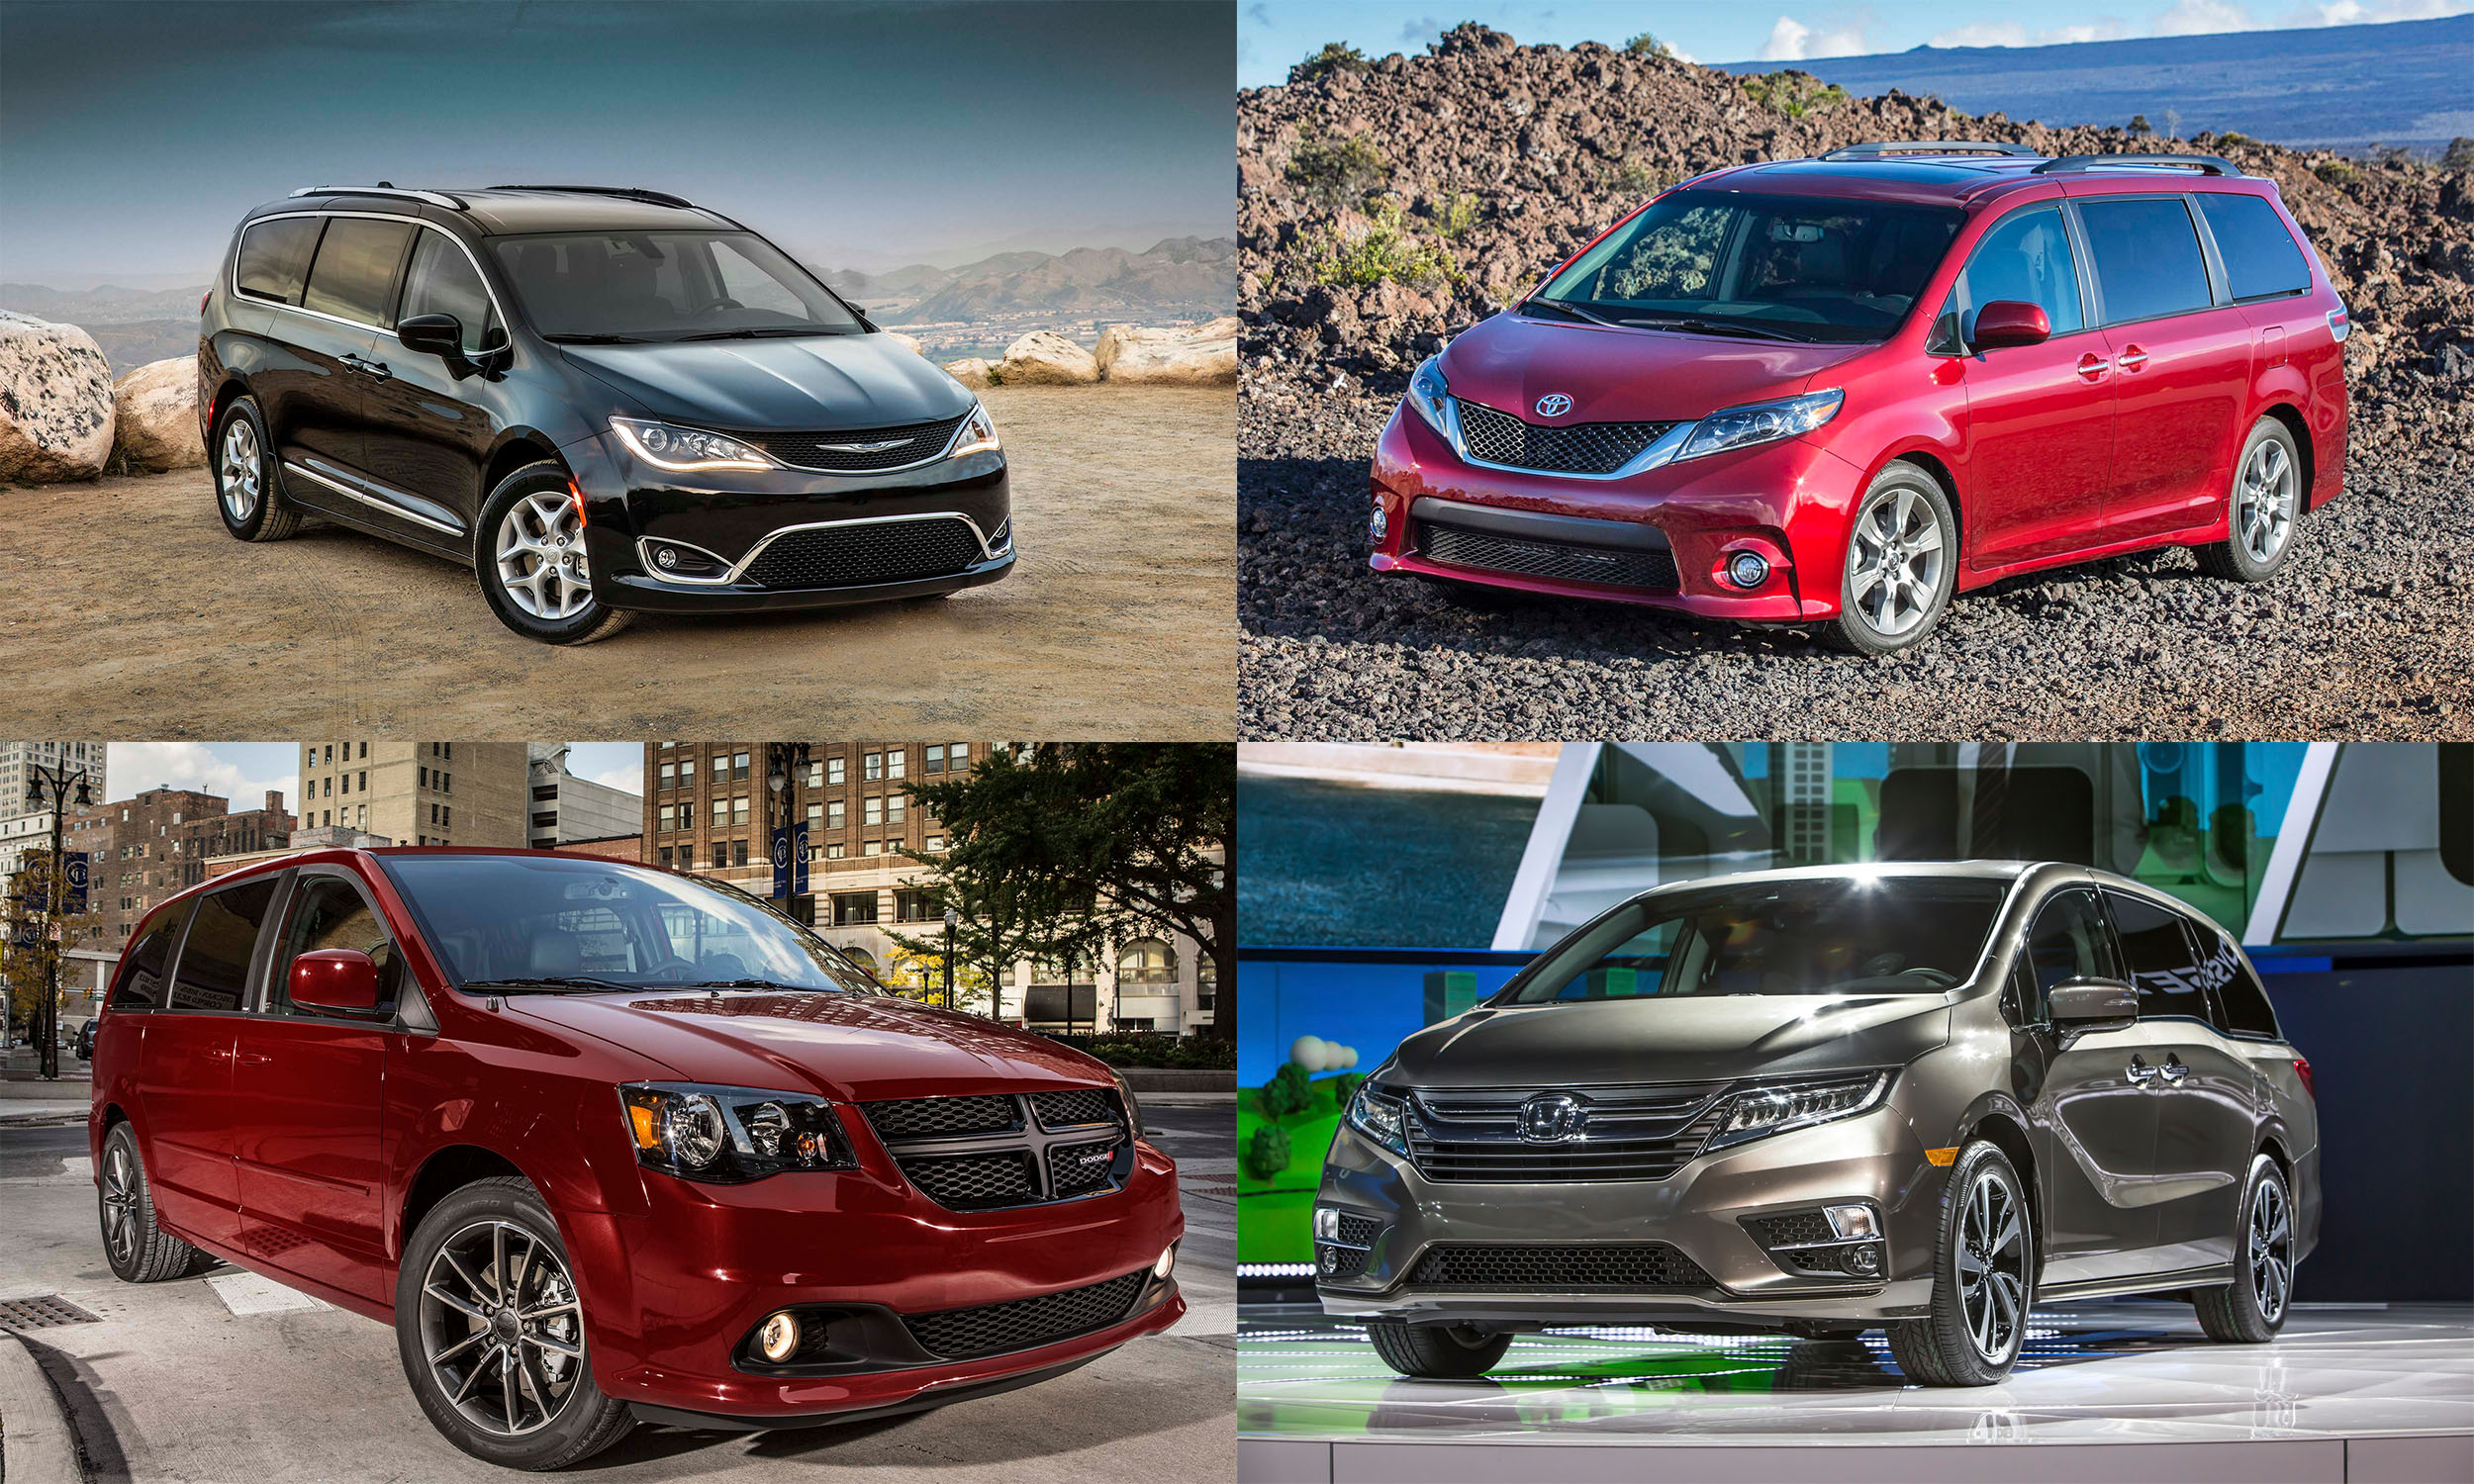 © FCA US LLC; Toyota Motor Sales, U.S.A.; Rod Hatfield; FCA US LLC